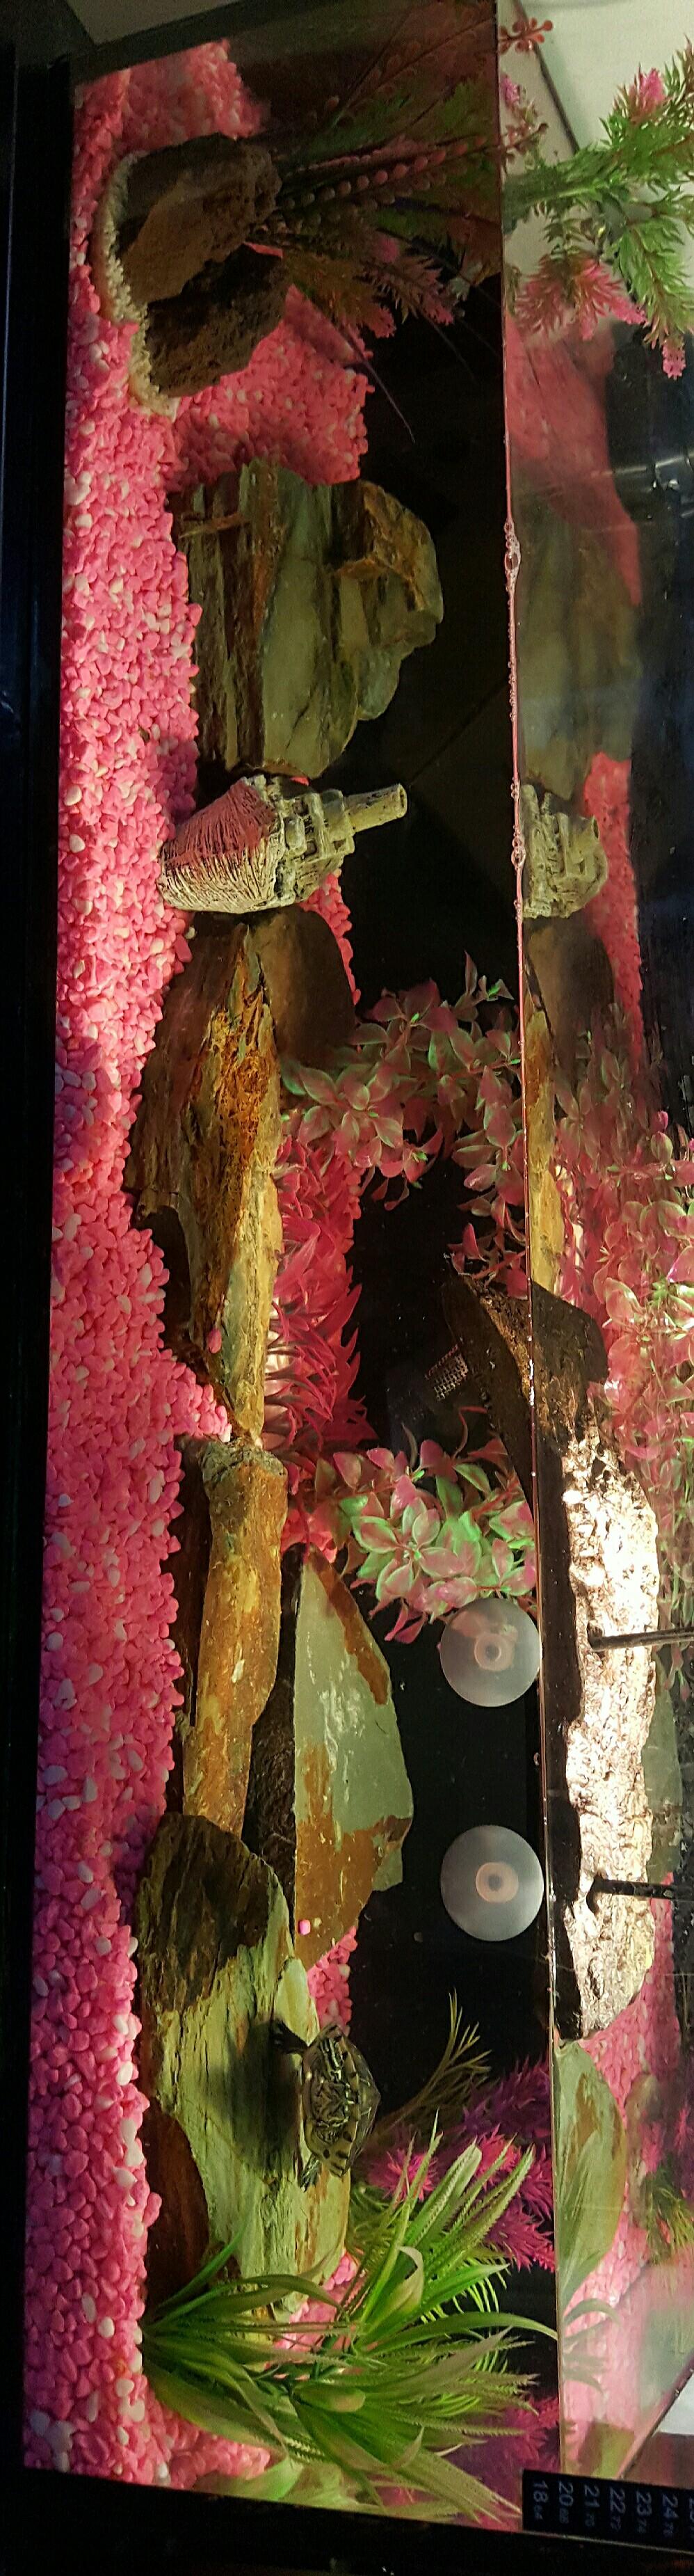 Yellow belly turtle set up terrarium vivariumthoughts pinterest